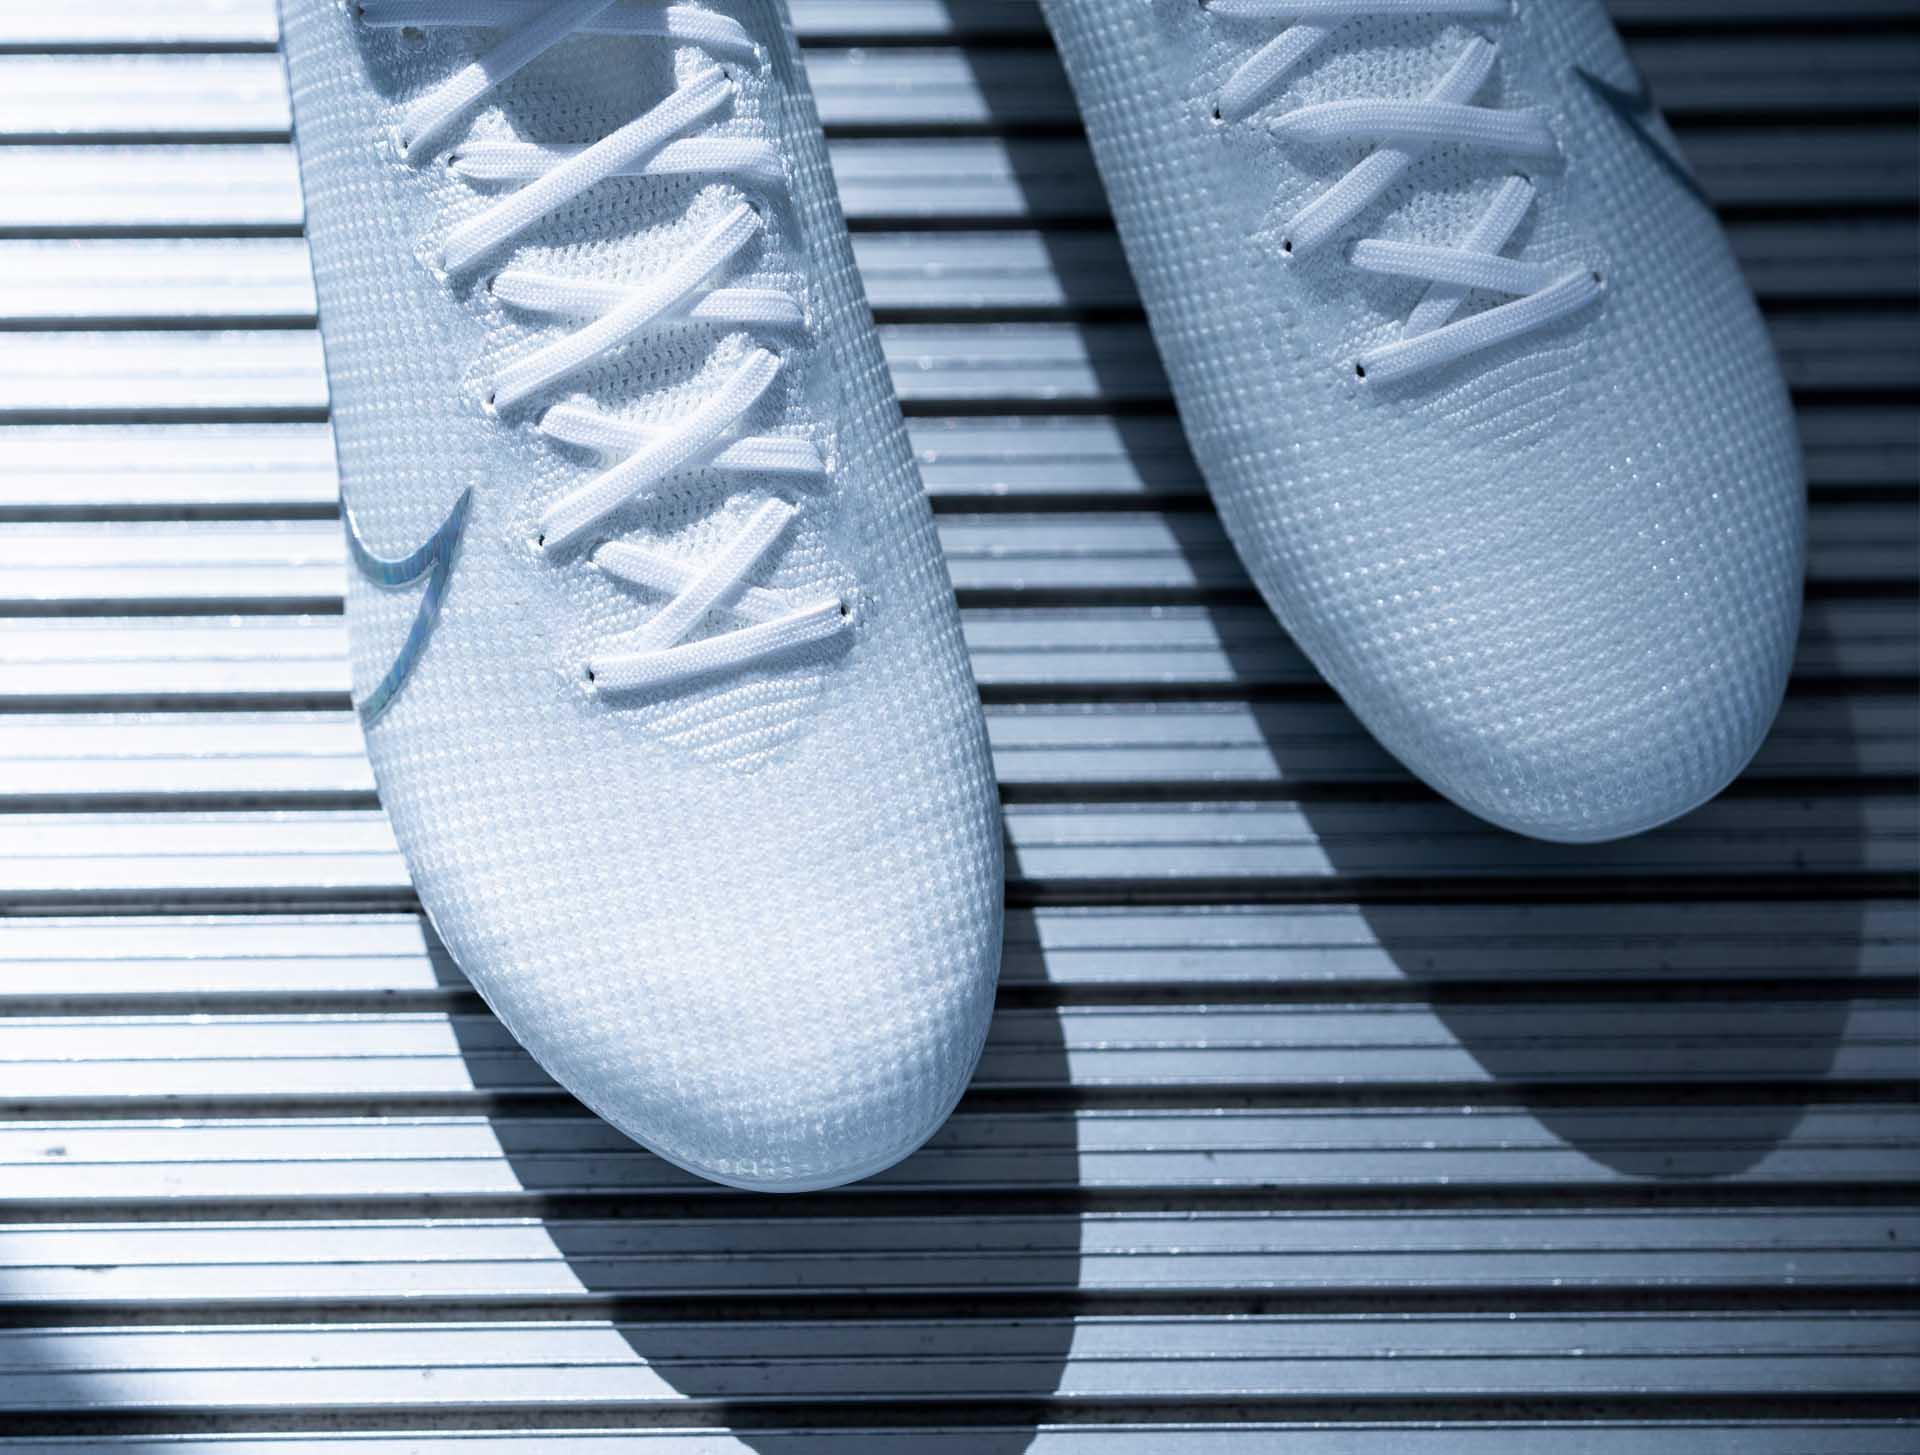 Giay da banh mau trang nike Nuovo White Pack (3)